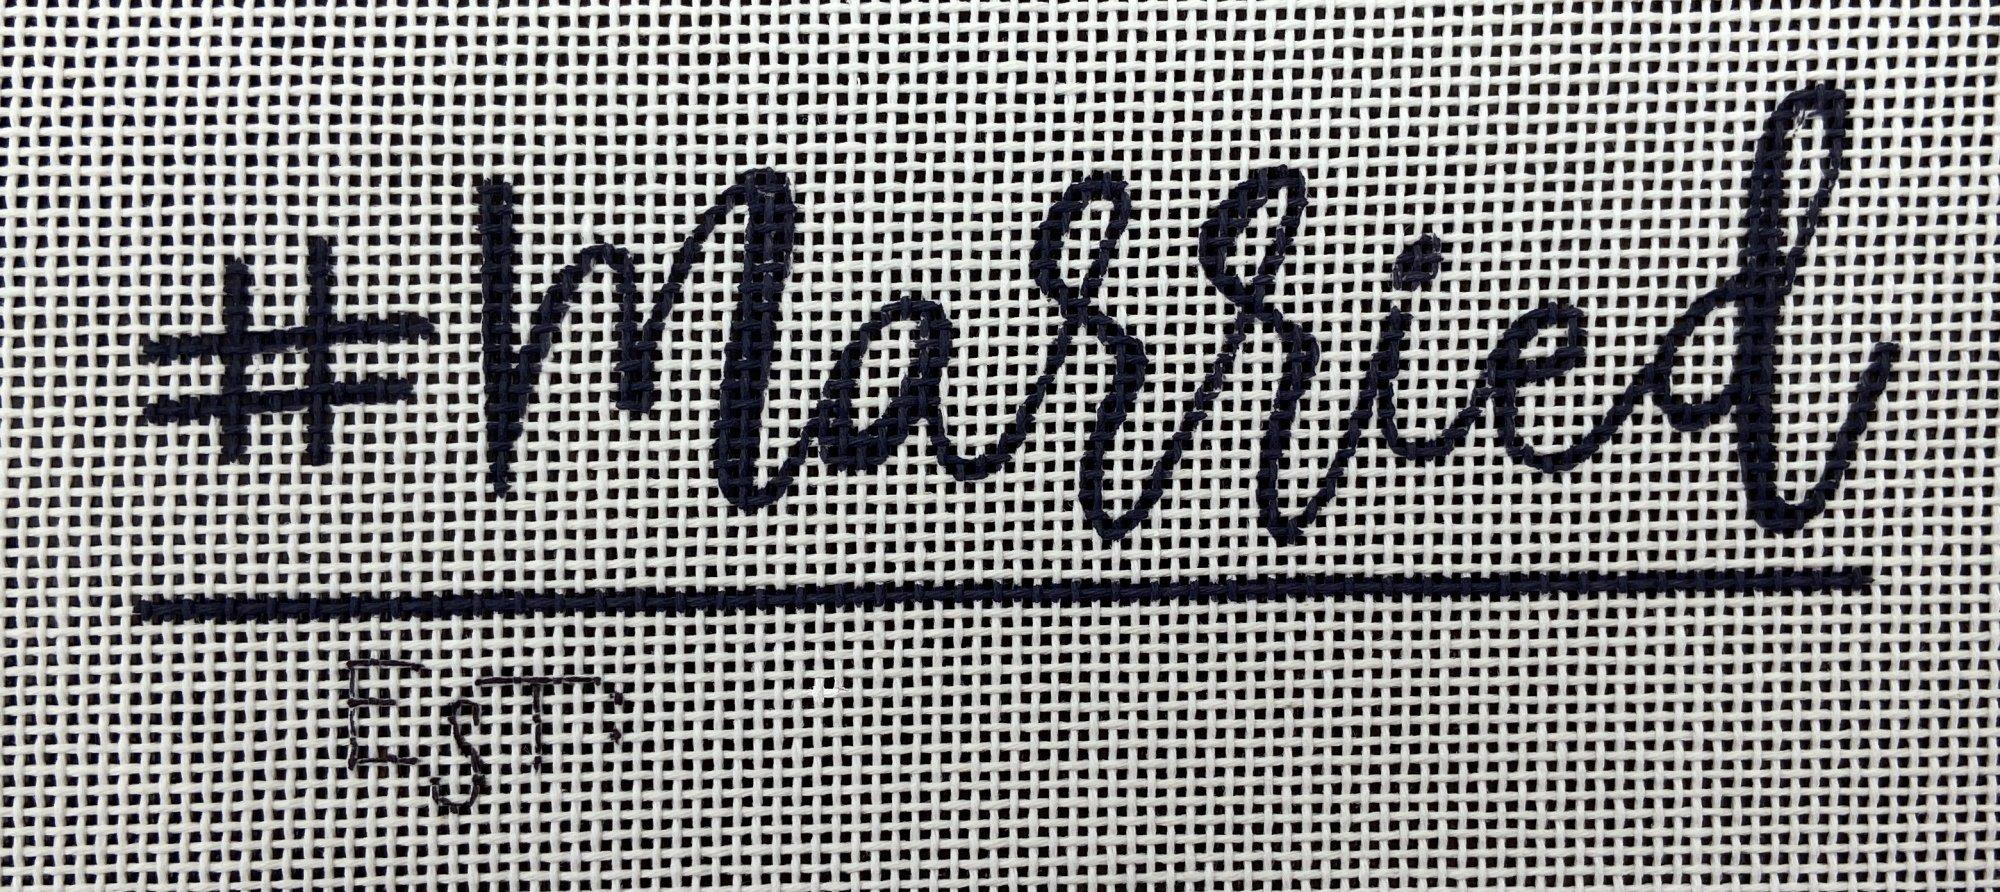 ONMB11 # Hashtag Married Oasis Needlepoint